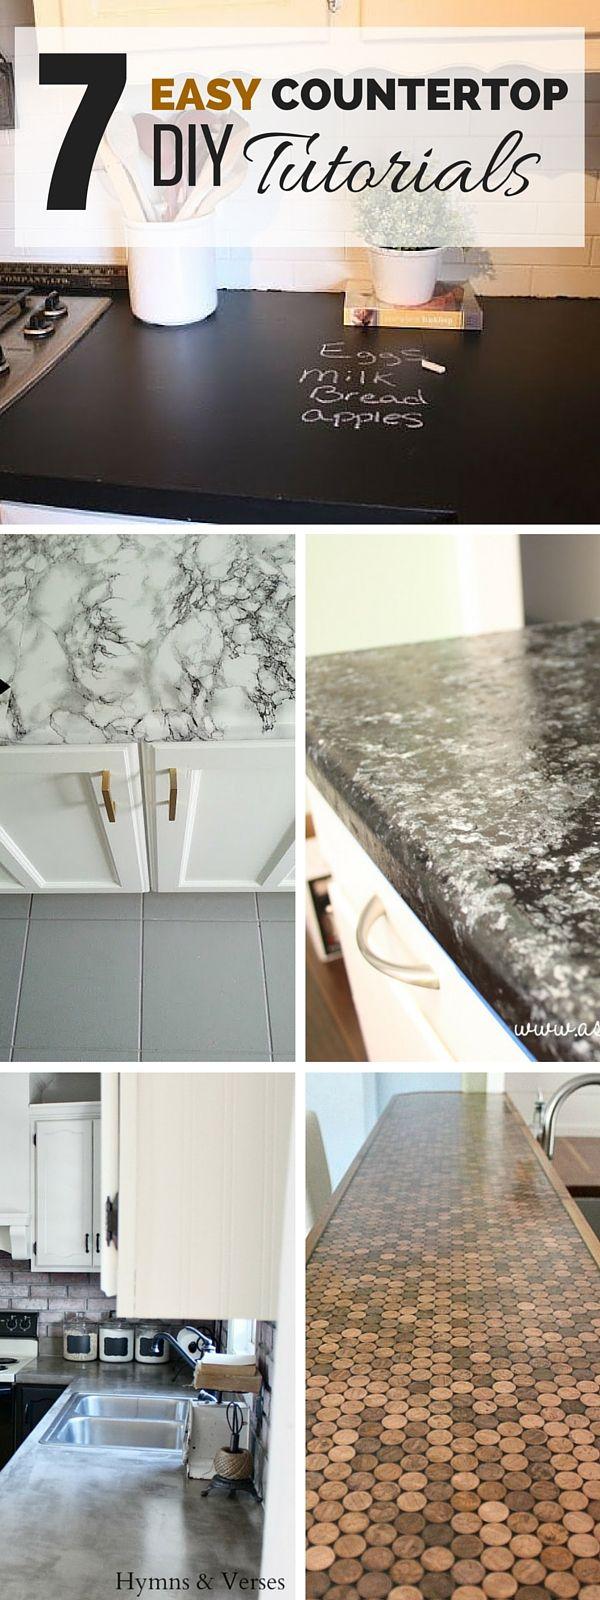 Best 25 diy countertops ideas on pinterest kitchen countertop diy paint laminate countertops - Diy redo kitchen countertops ...